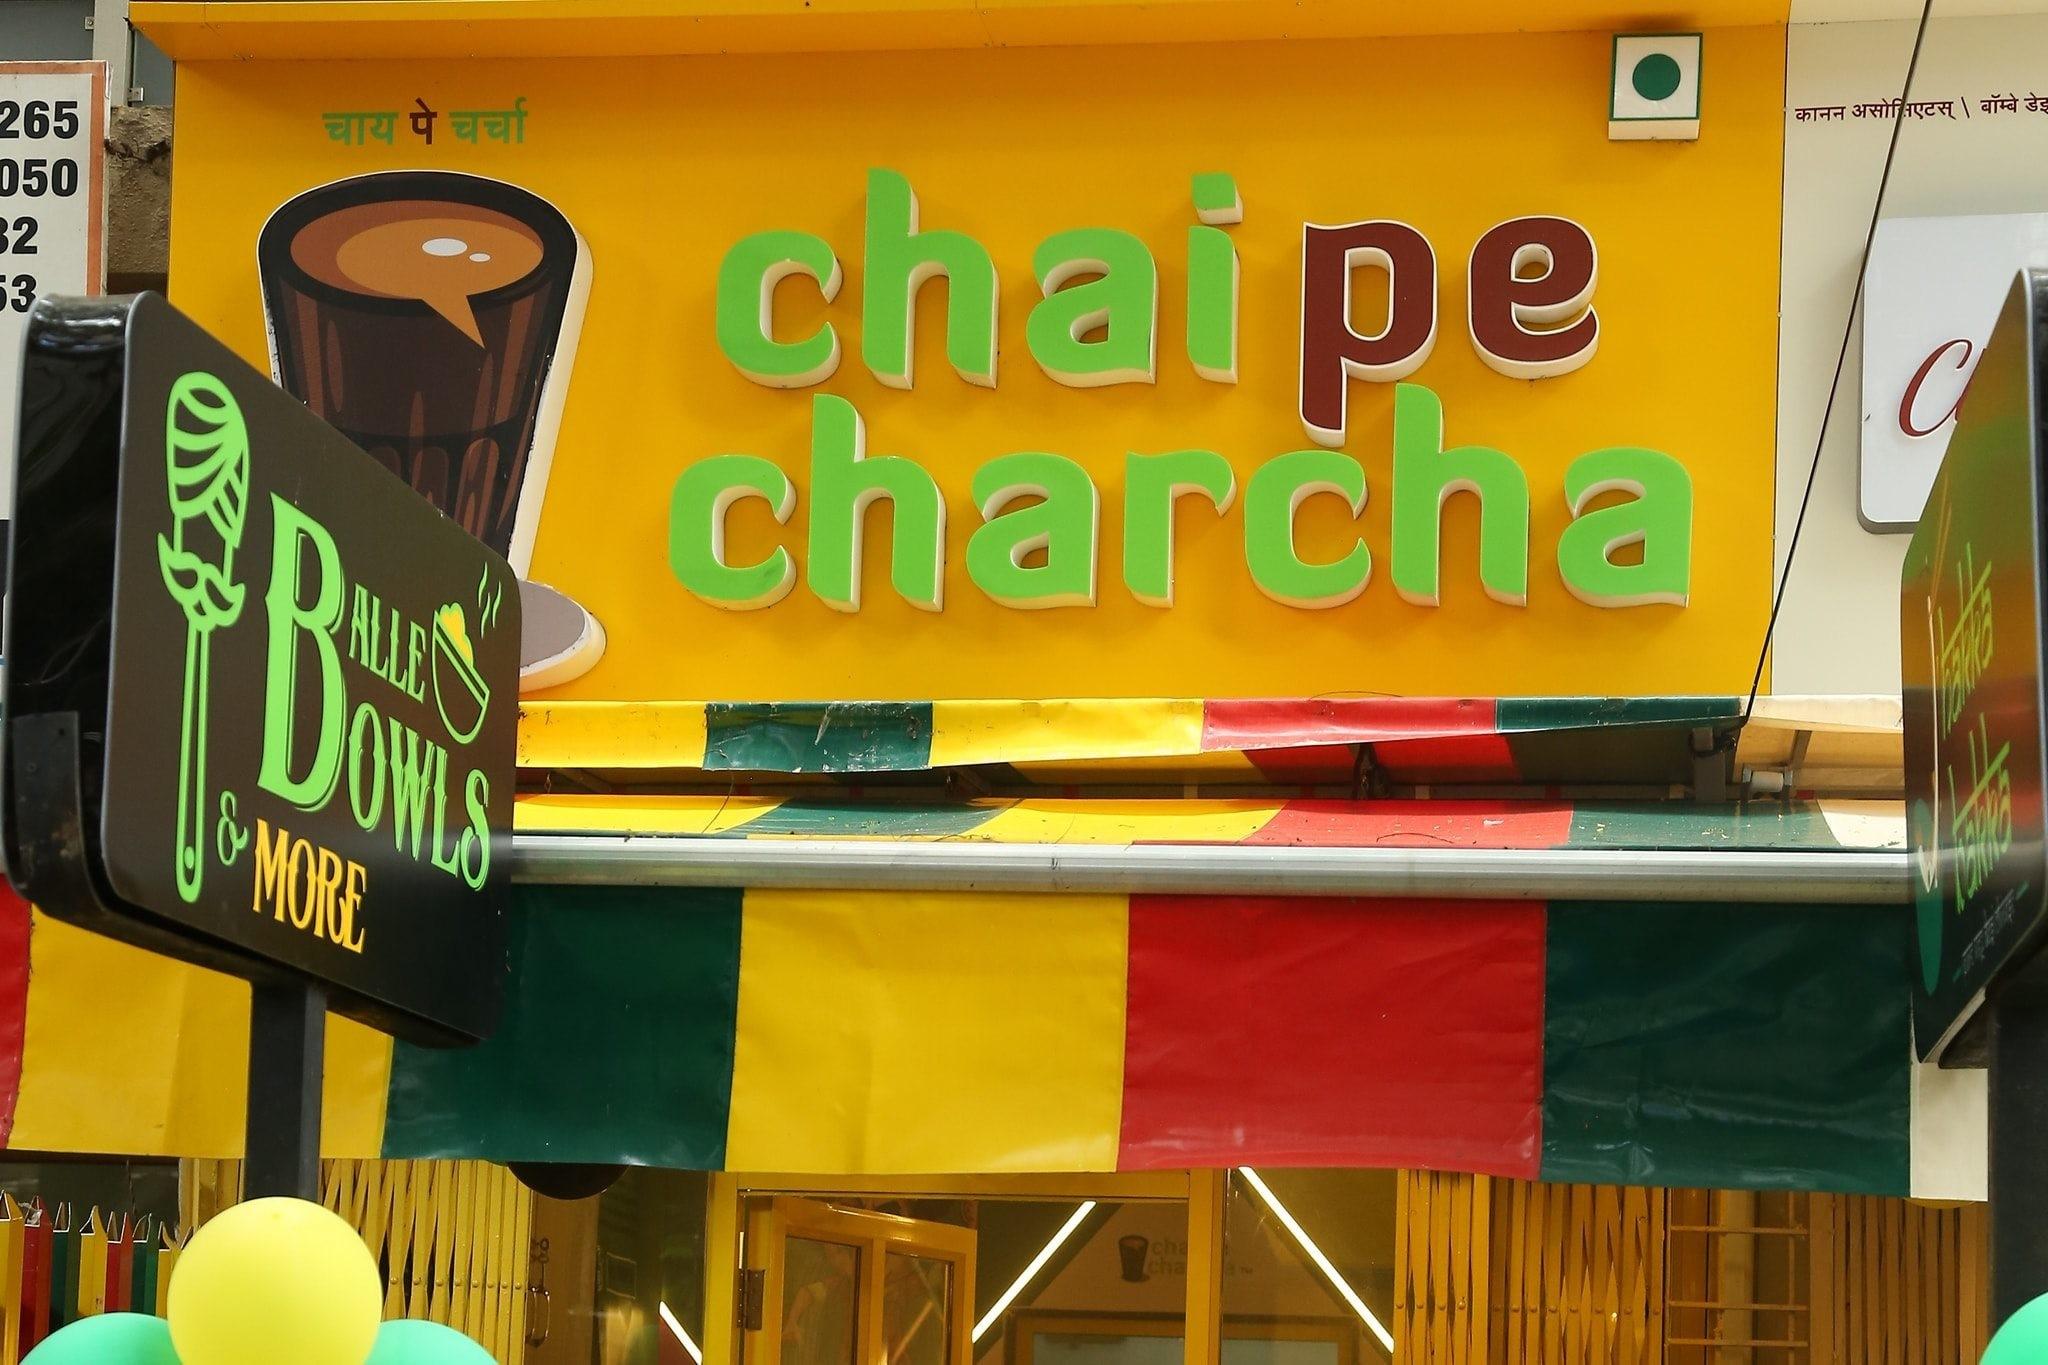 Chai Pe Charcha Prabhadevi